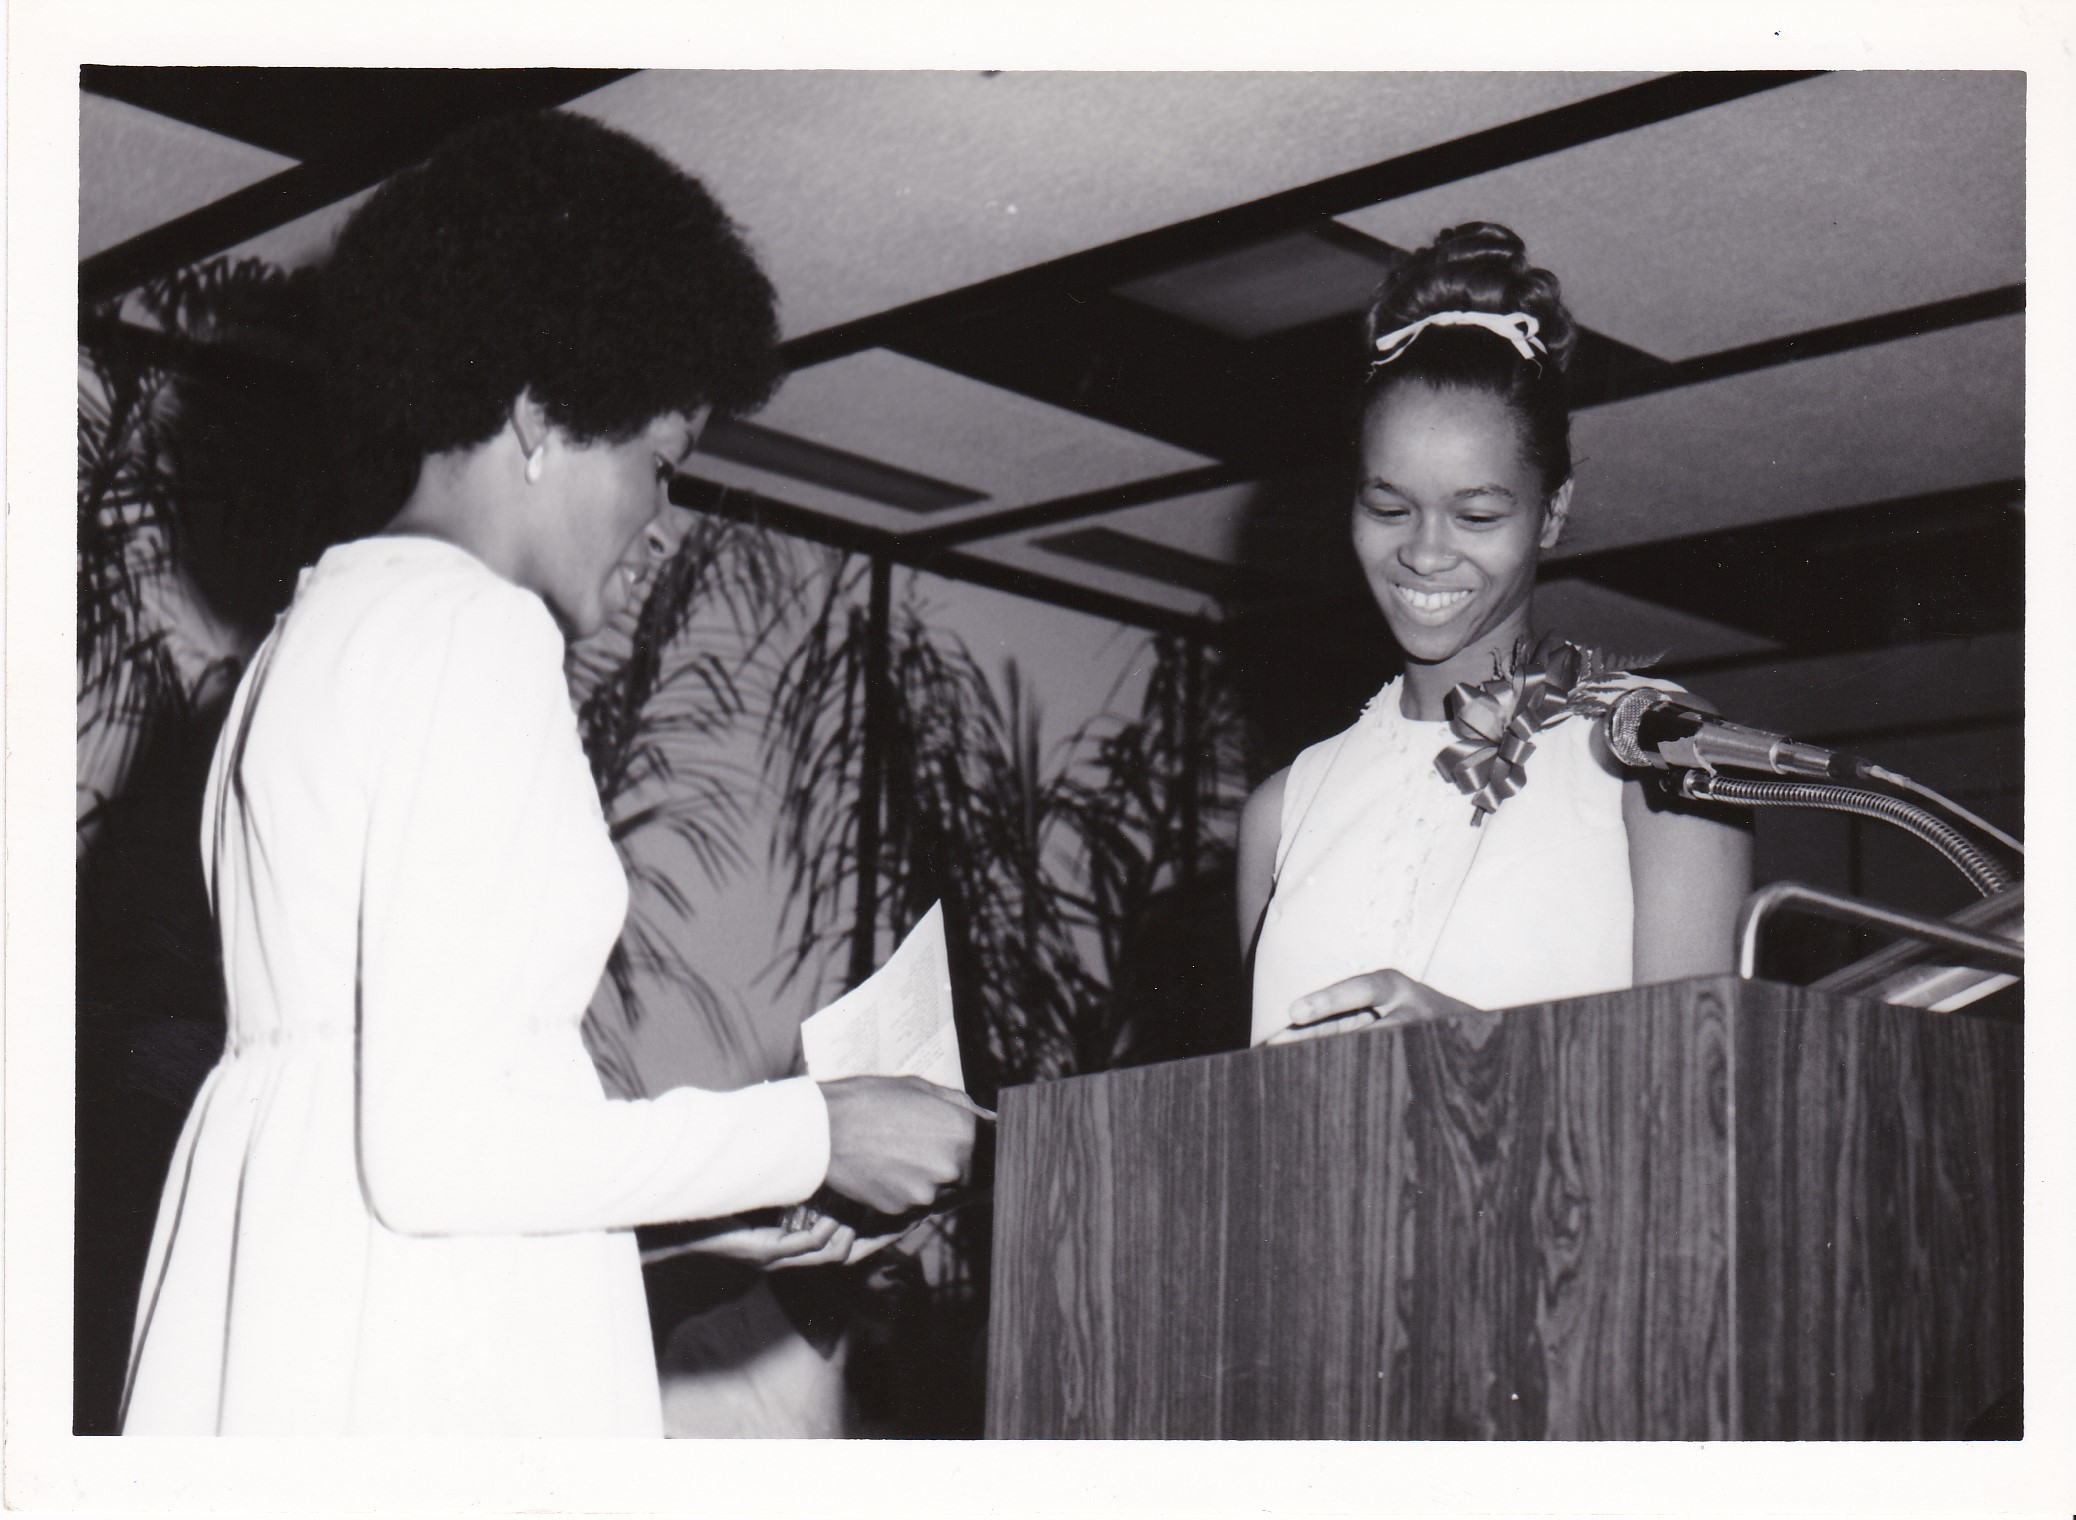 '72 Cora Watkins '72 and Rhonda Dauphin '69